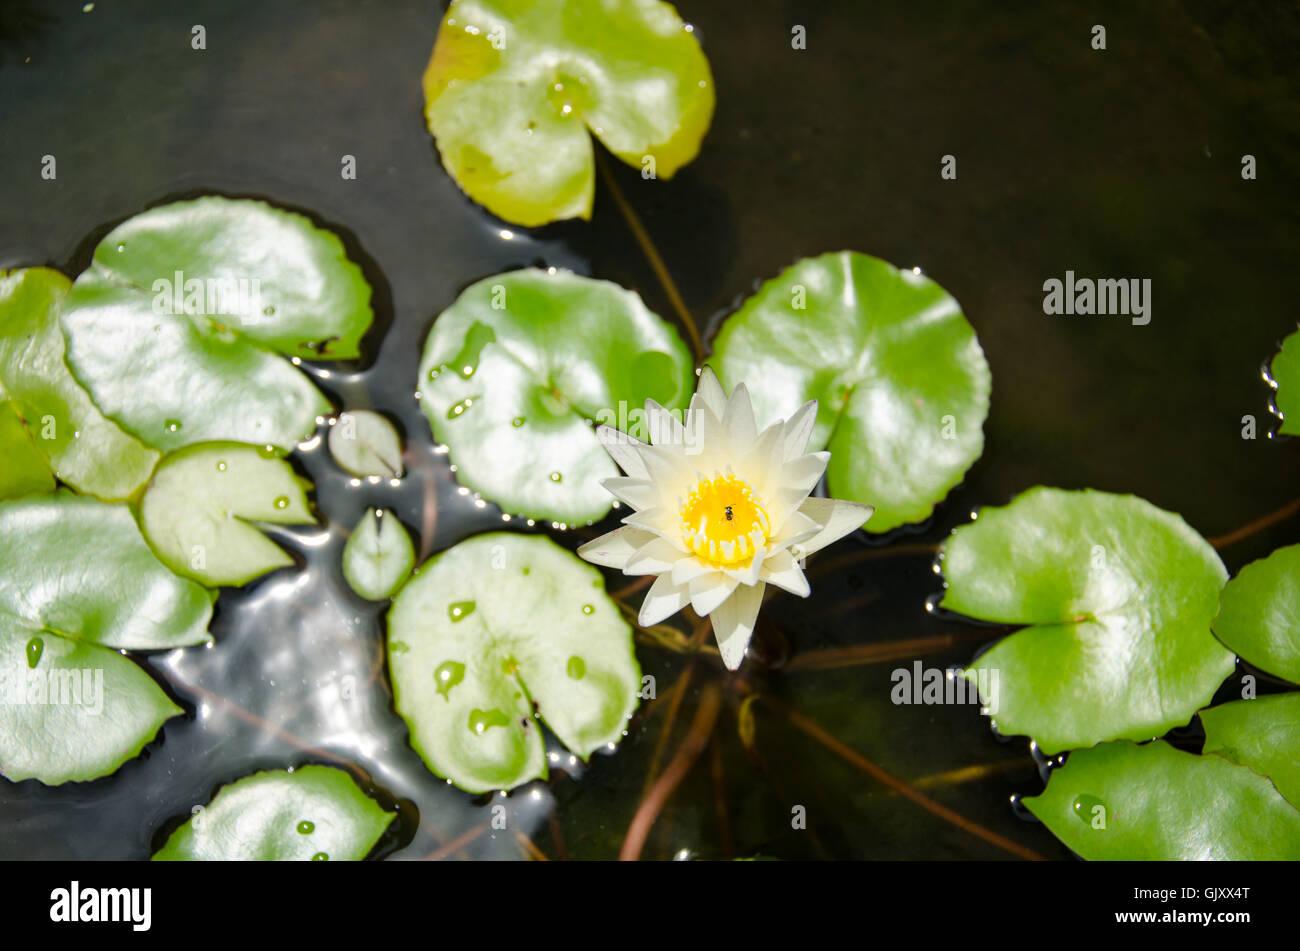 Lotus flower bangkok thailand stock photos lotus flower bangkok white thai lotus flower bangkok thailand stock image izmirmasajfo